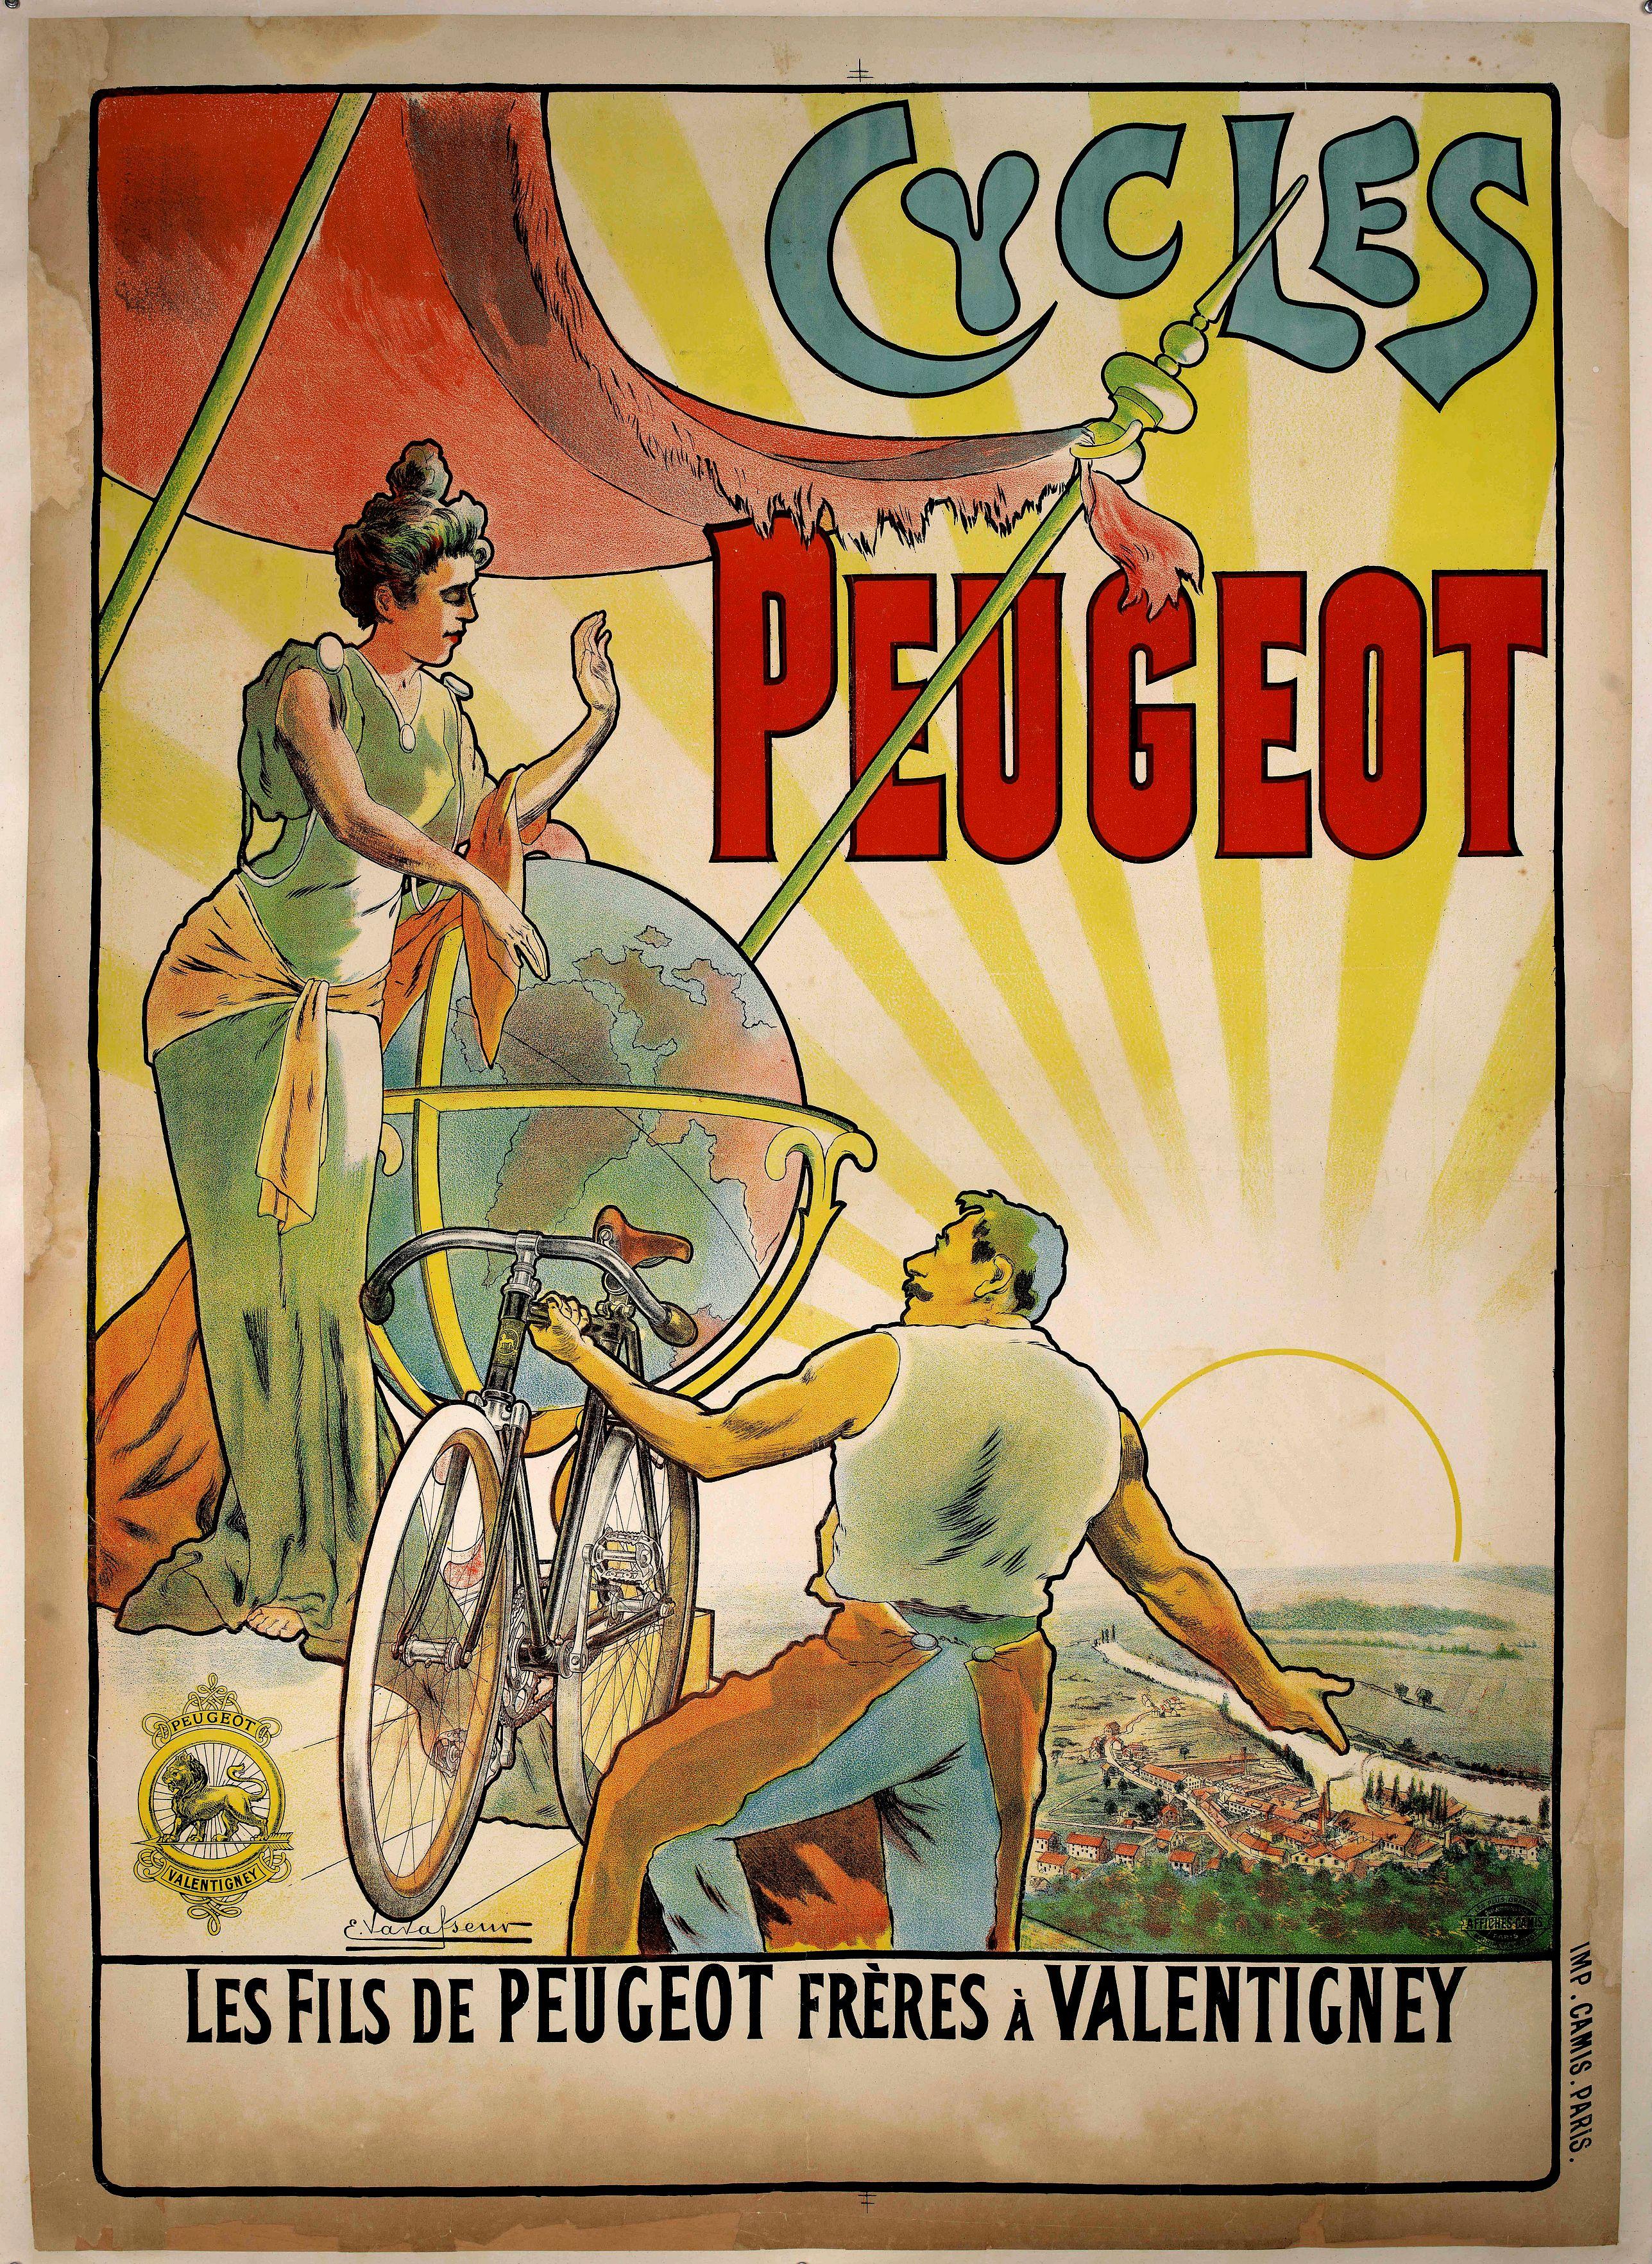 VAVASSEUR, E. -  Cycles Peugeot.